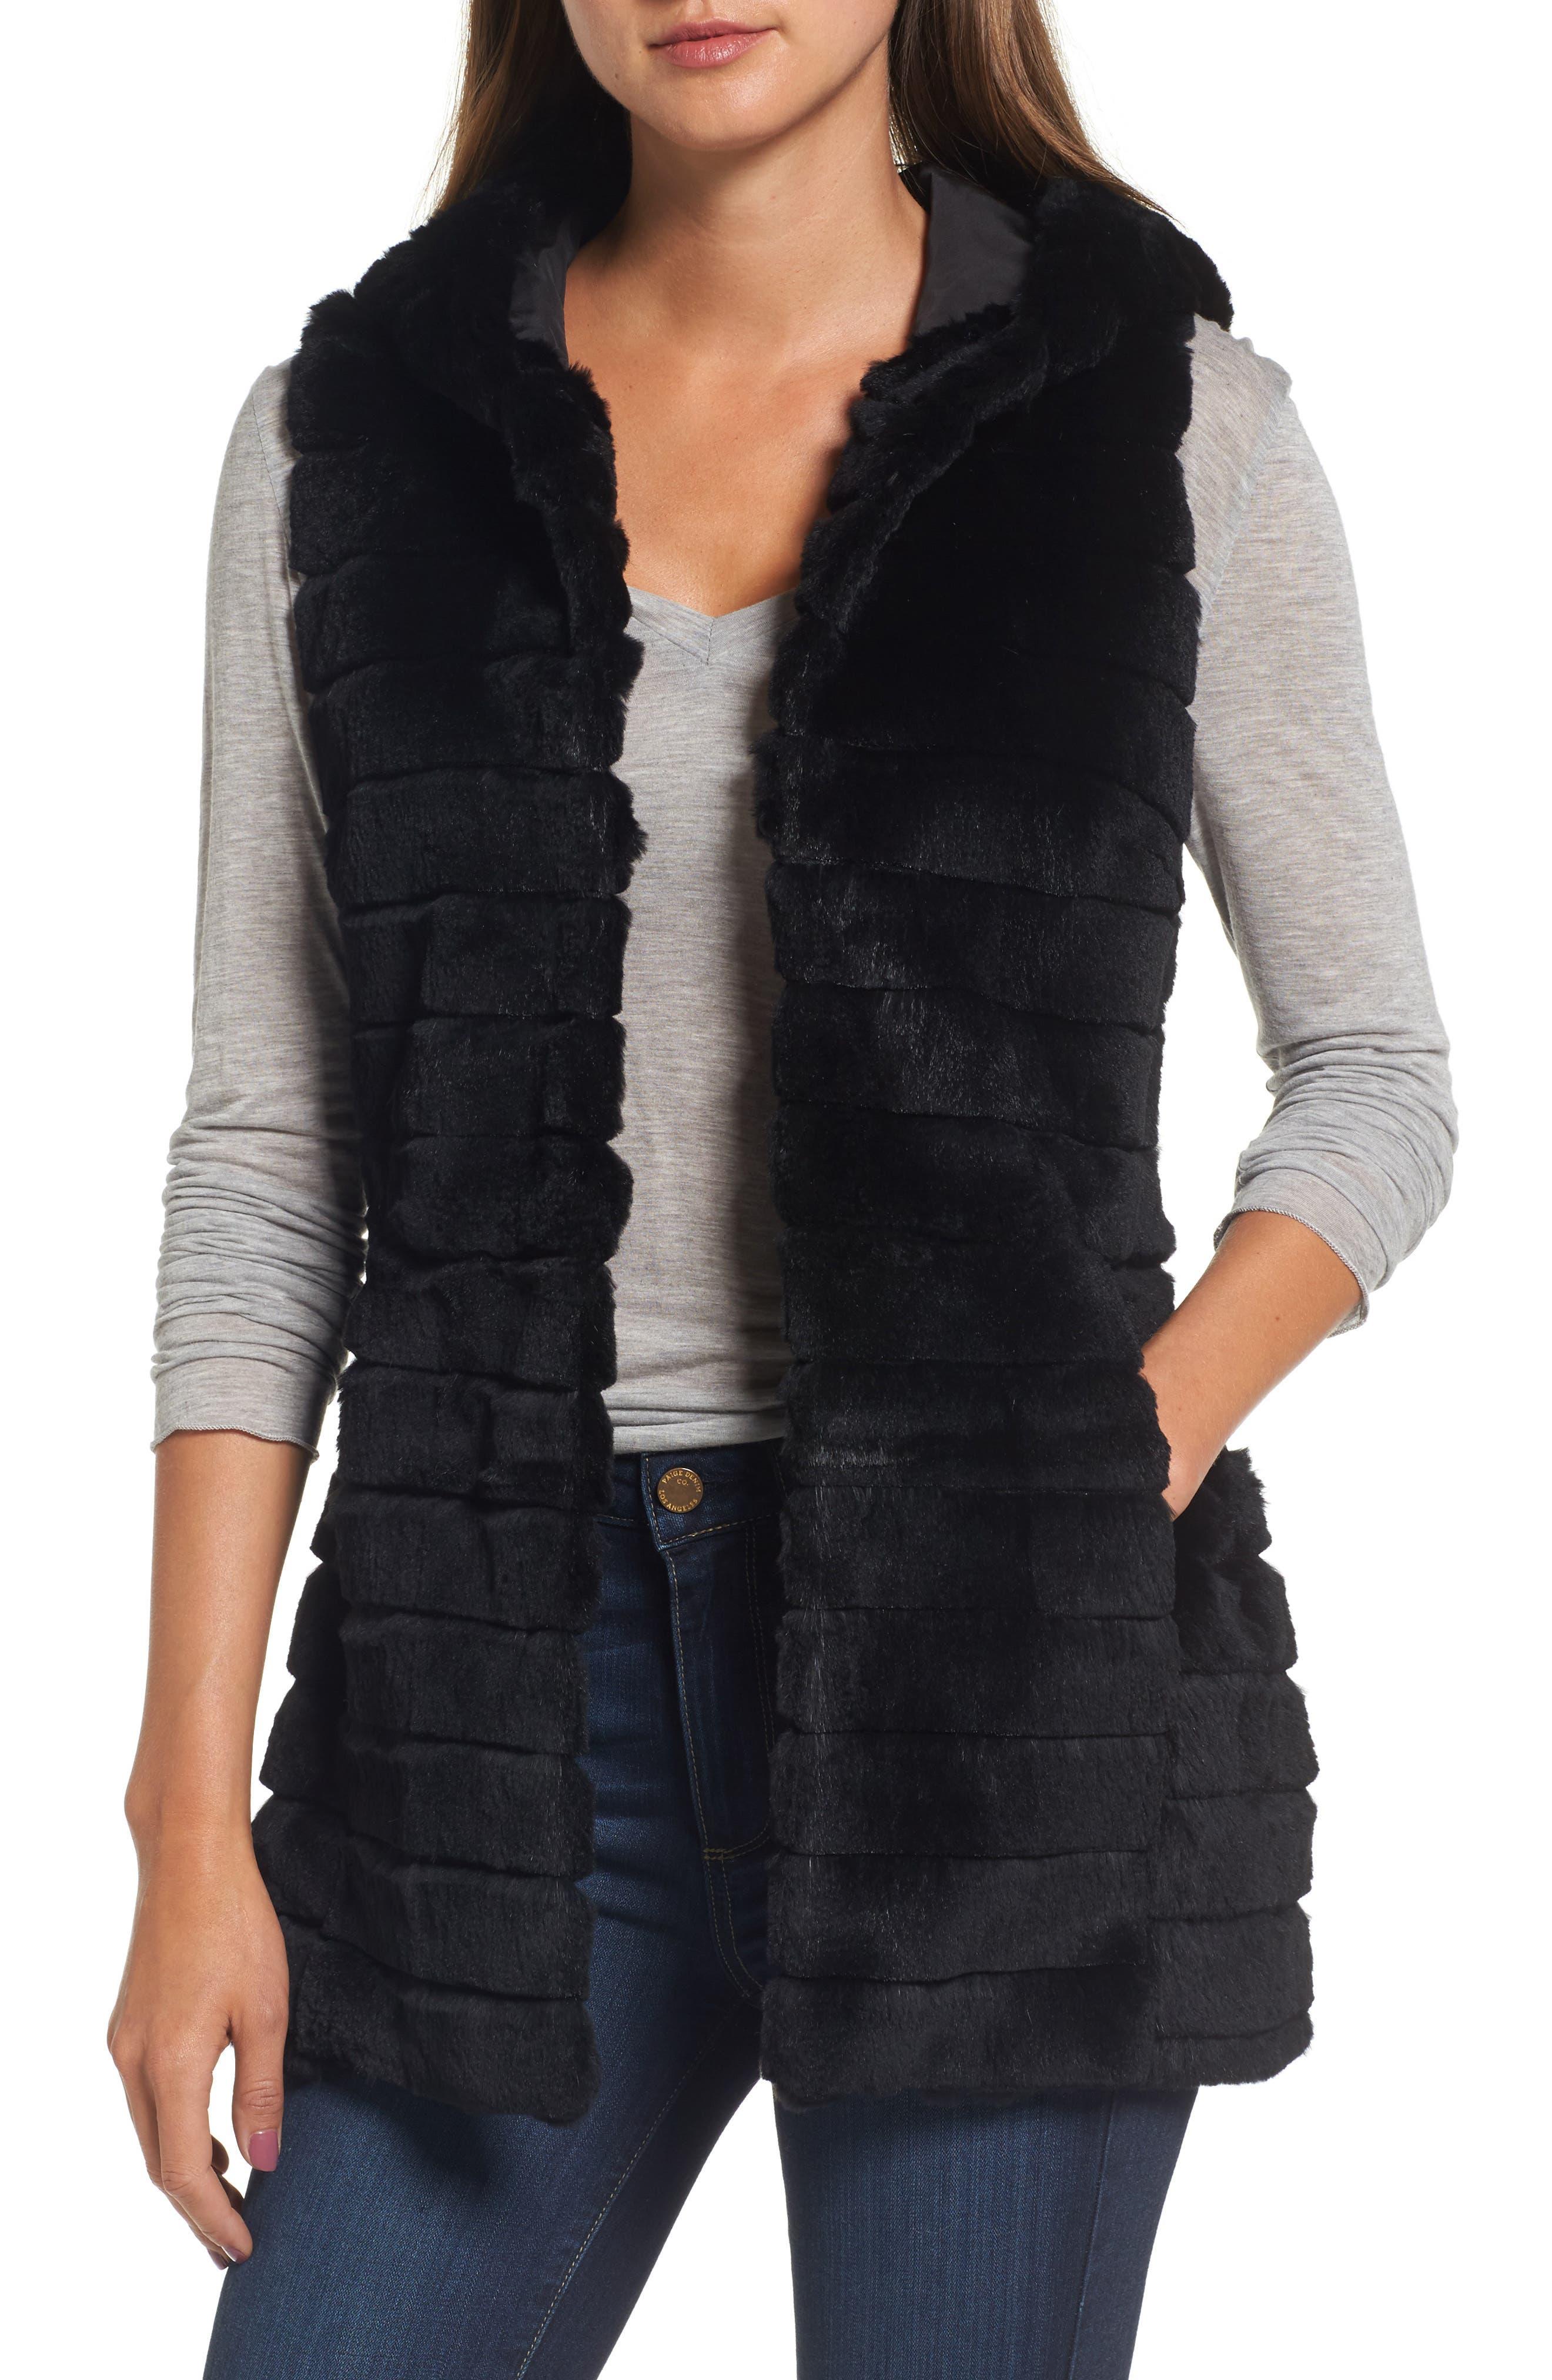 Main Image - Love Token Genuine Rabbit Fur Hooded Vest